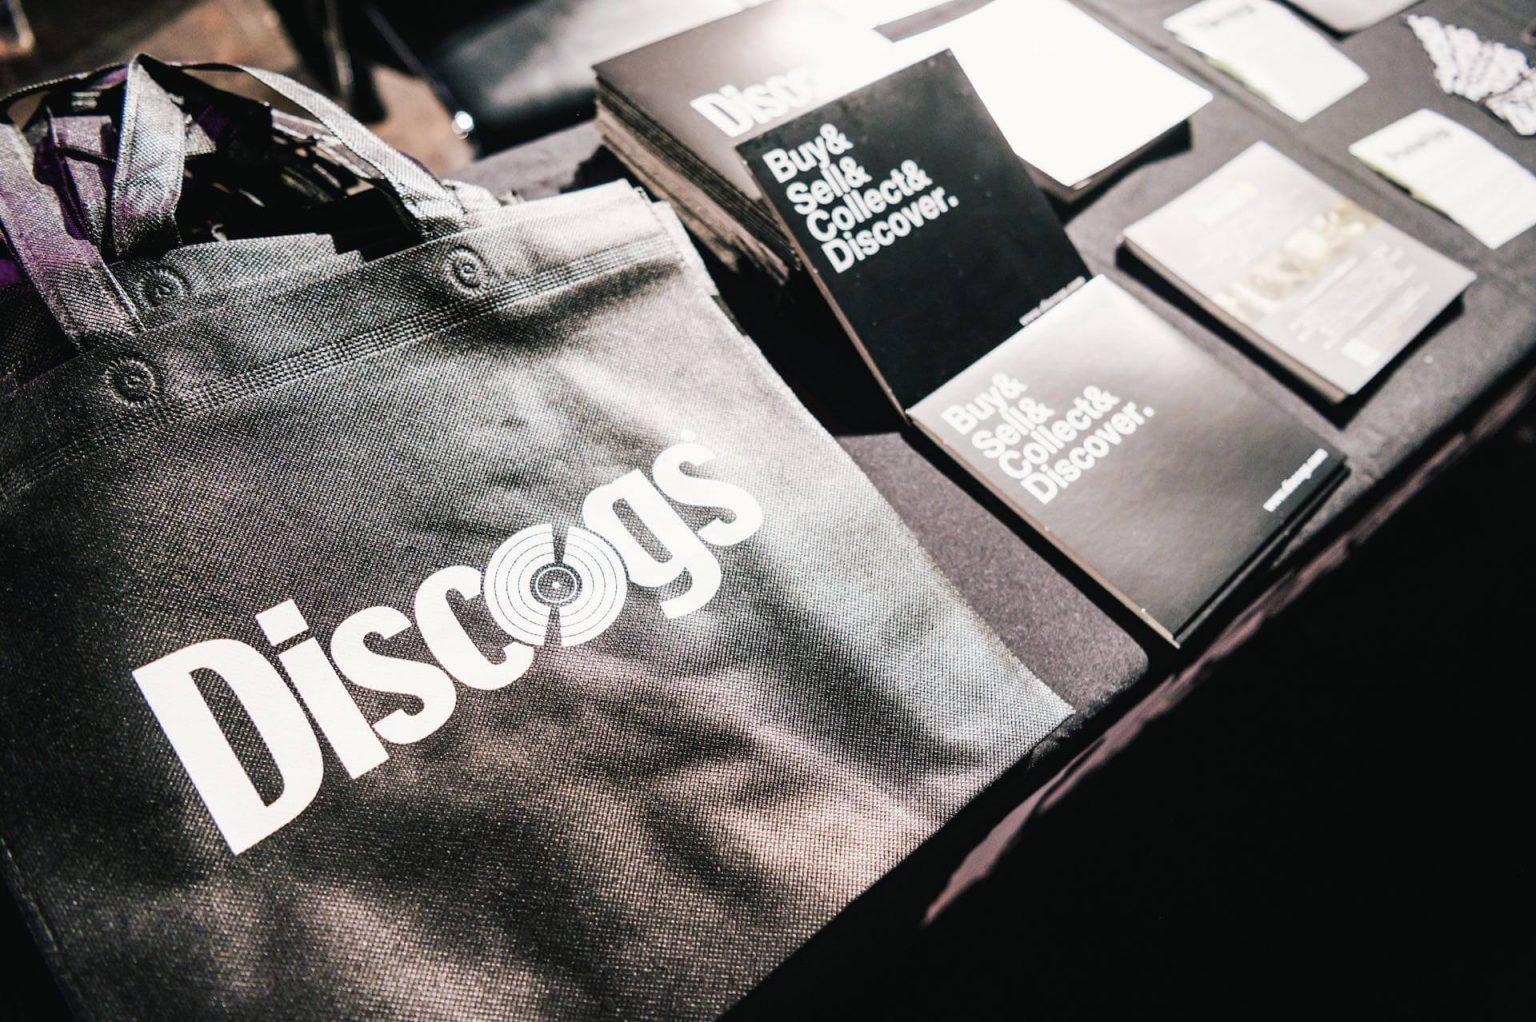 20191102_qetic-01-1440x959 レコード市と音楽パフォーマンスを同時に楽しめるレコード・フェス:Discogs Presents Mystic Crates